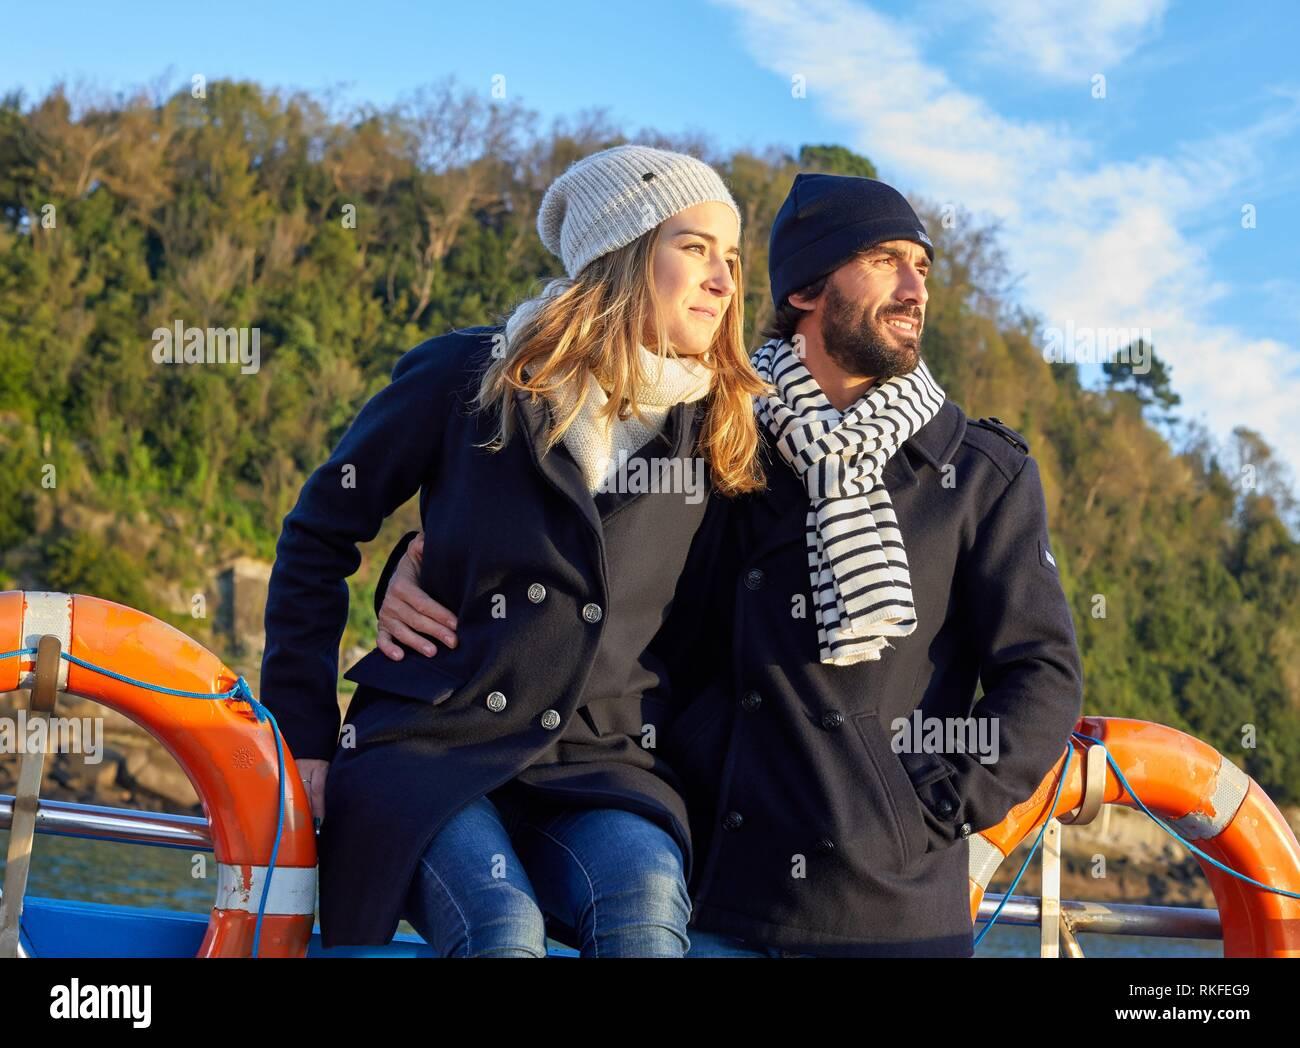 Pareja en un viaje en barco a la Isla Santa Clara, Donostia, San Sebastián, Gipuzkoa, País Vasco, España, Europa, Invierno Imagen De Stock